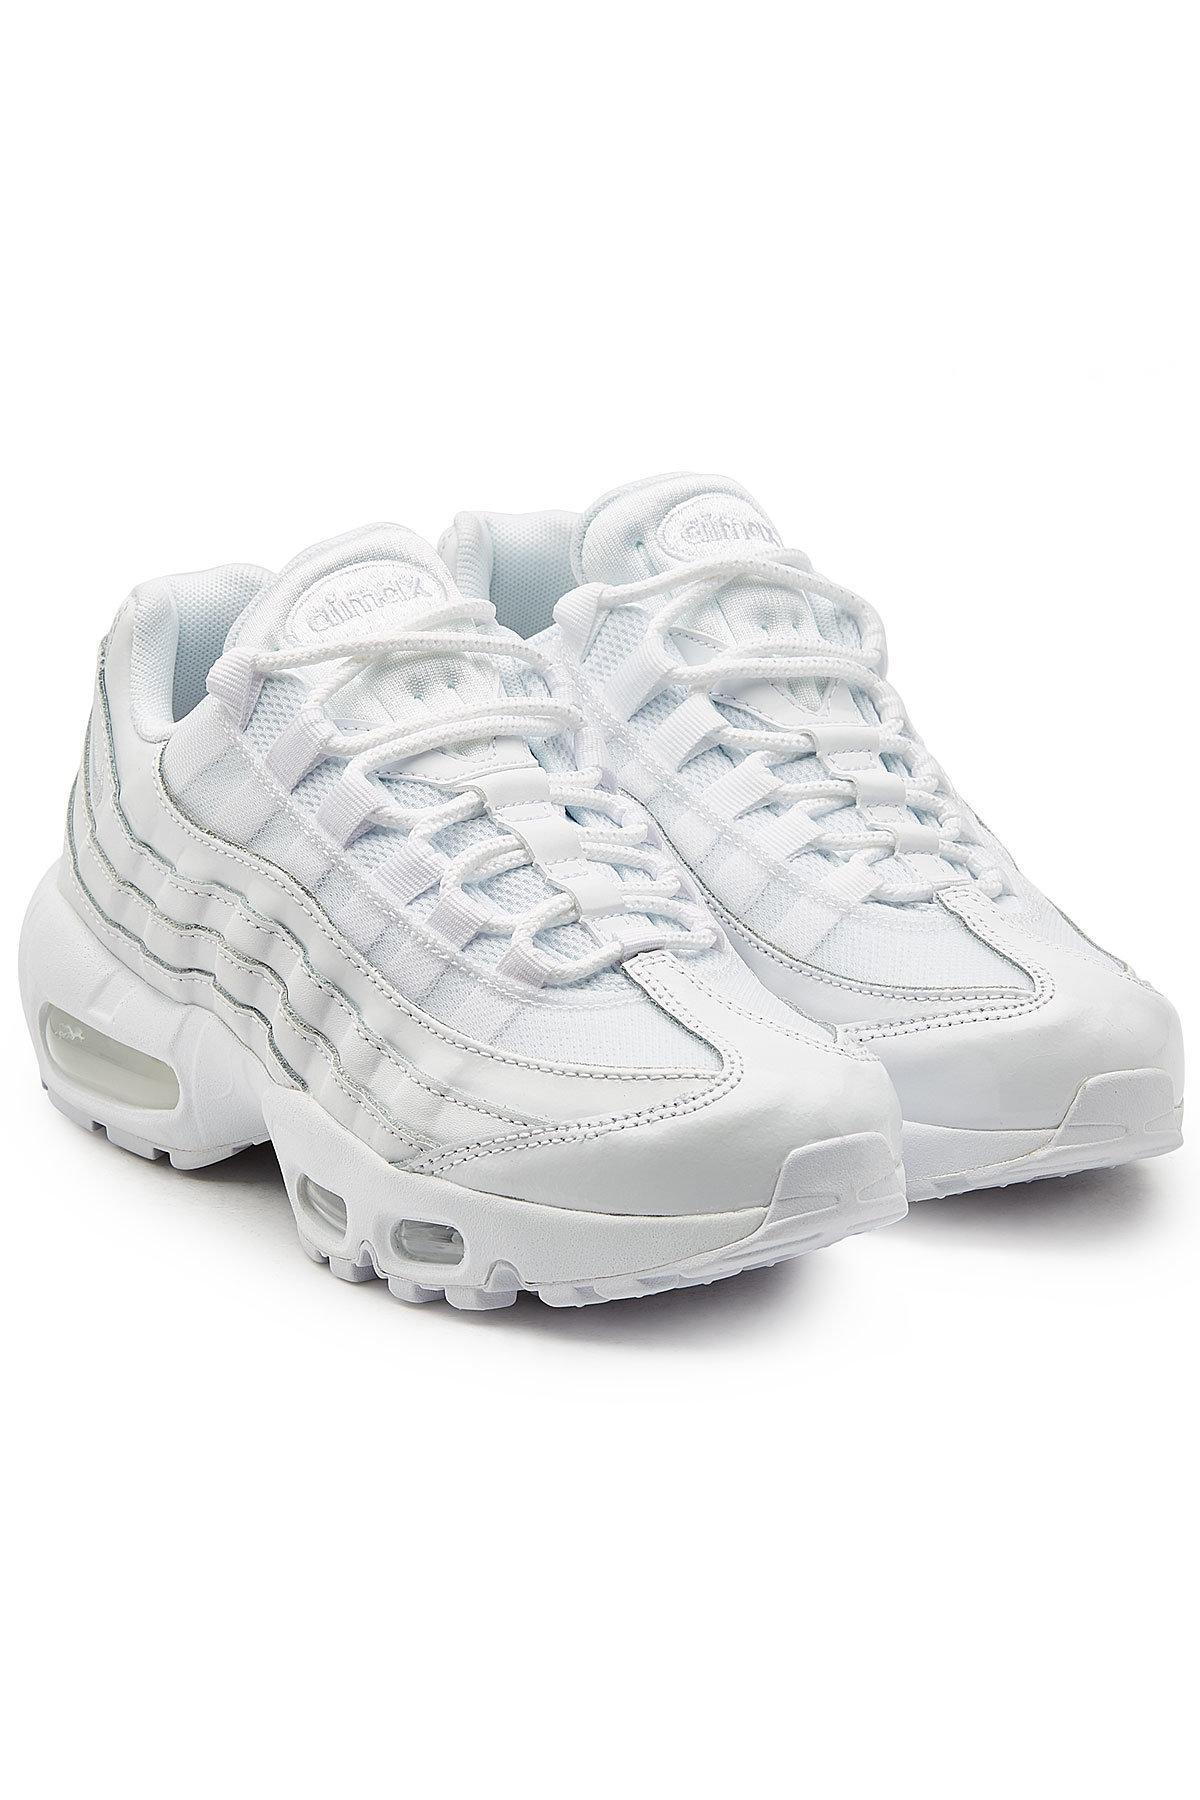 White Mesh Sneakers Women's With Max 95 Air 0Pk8wnO